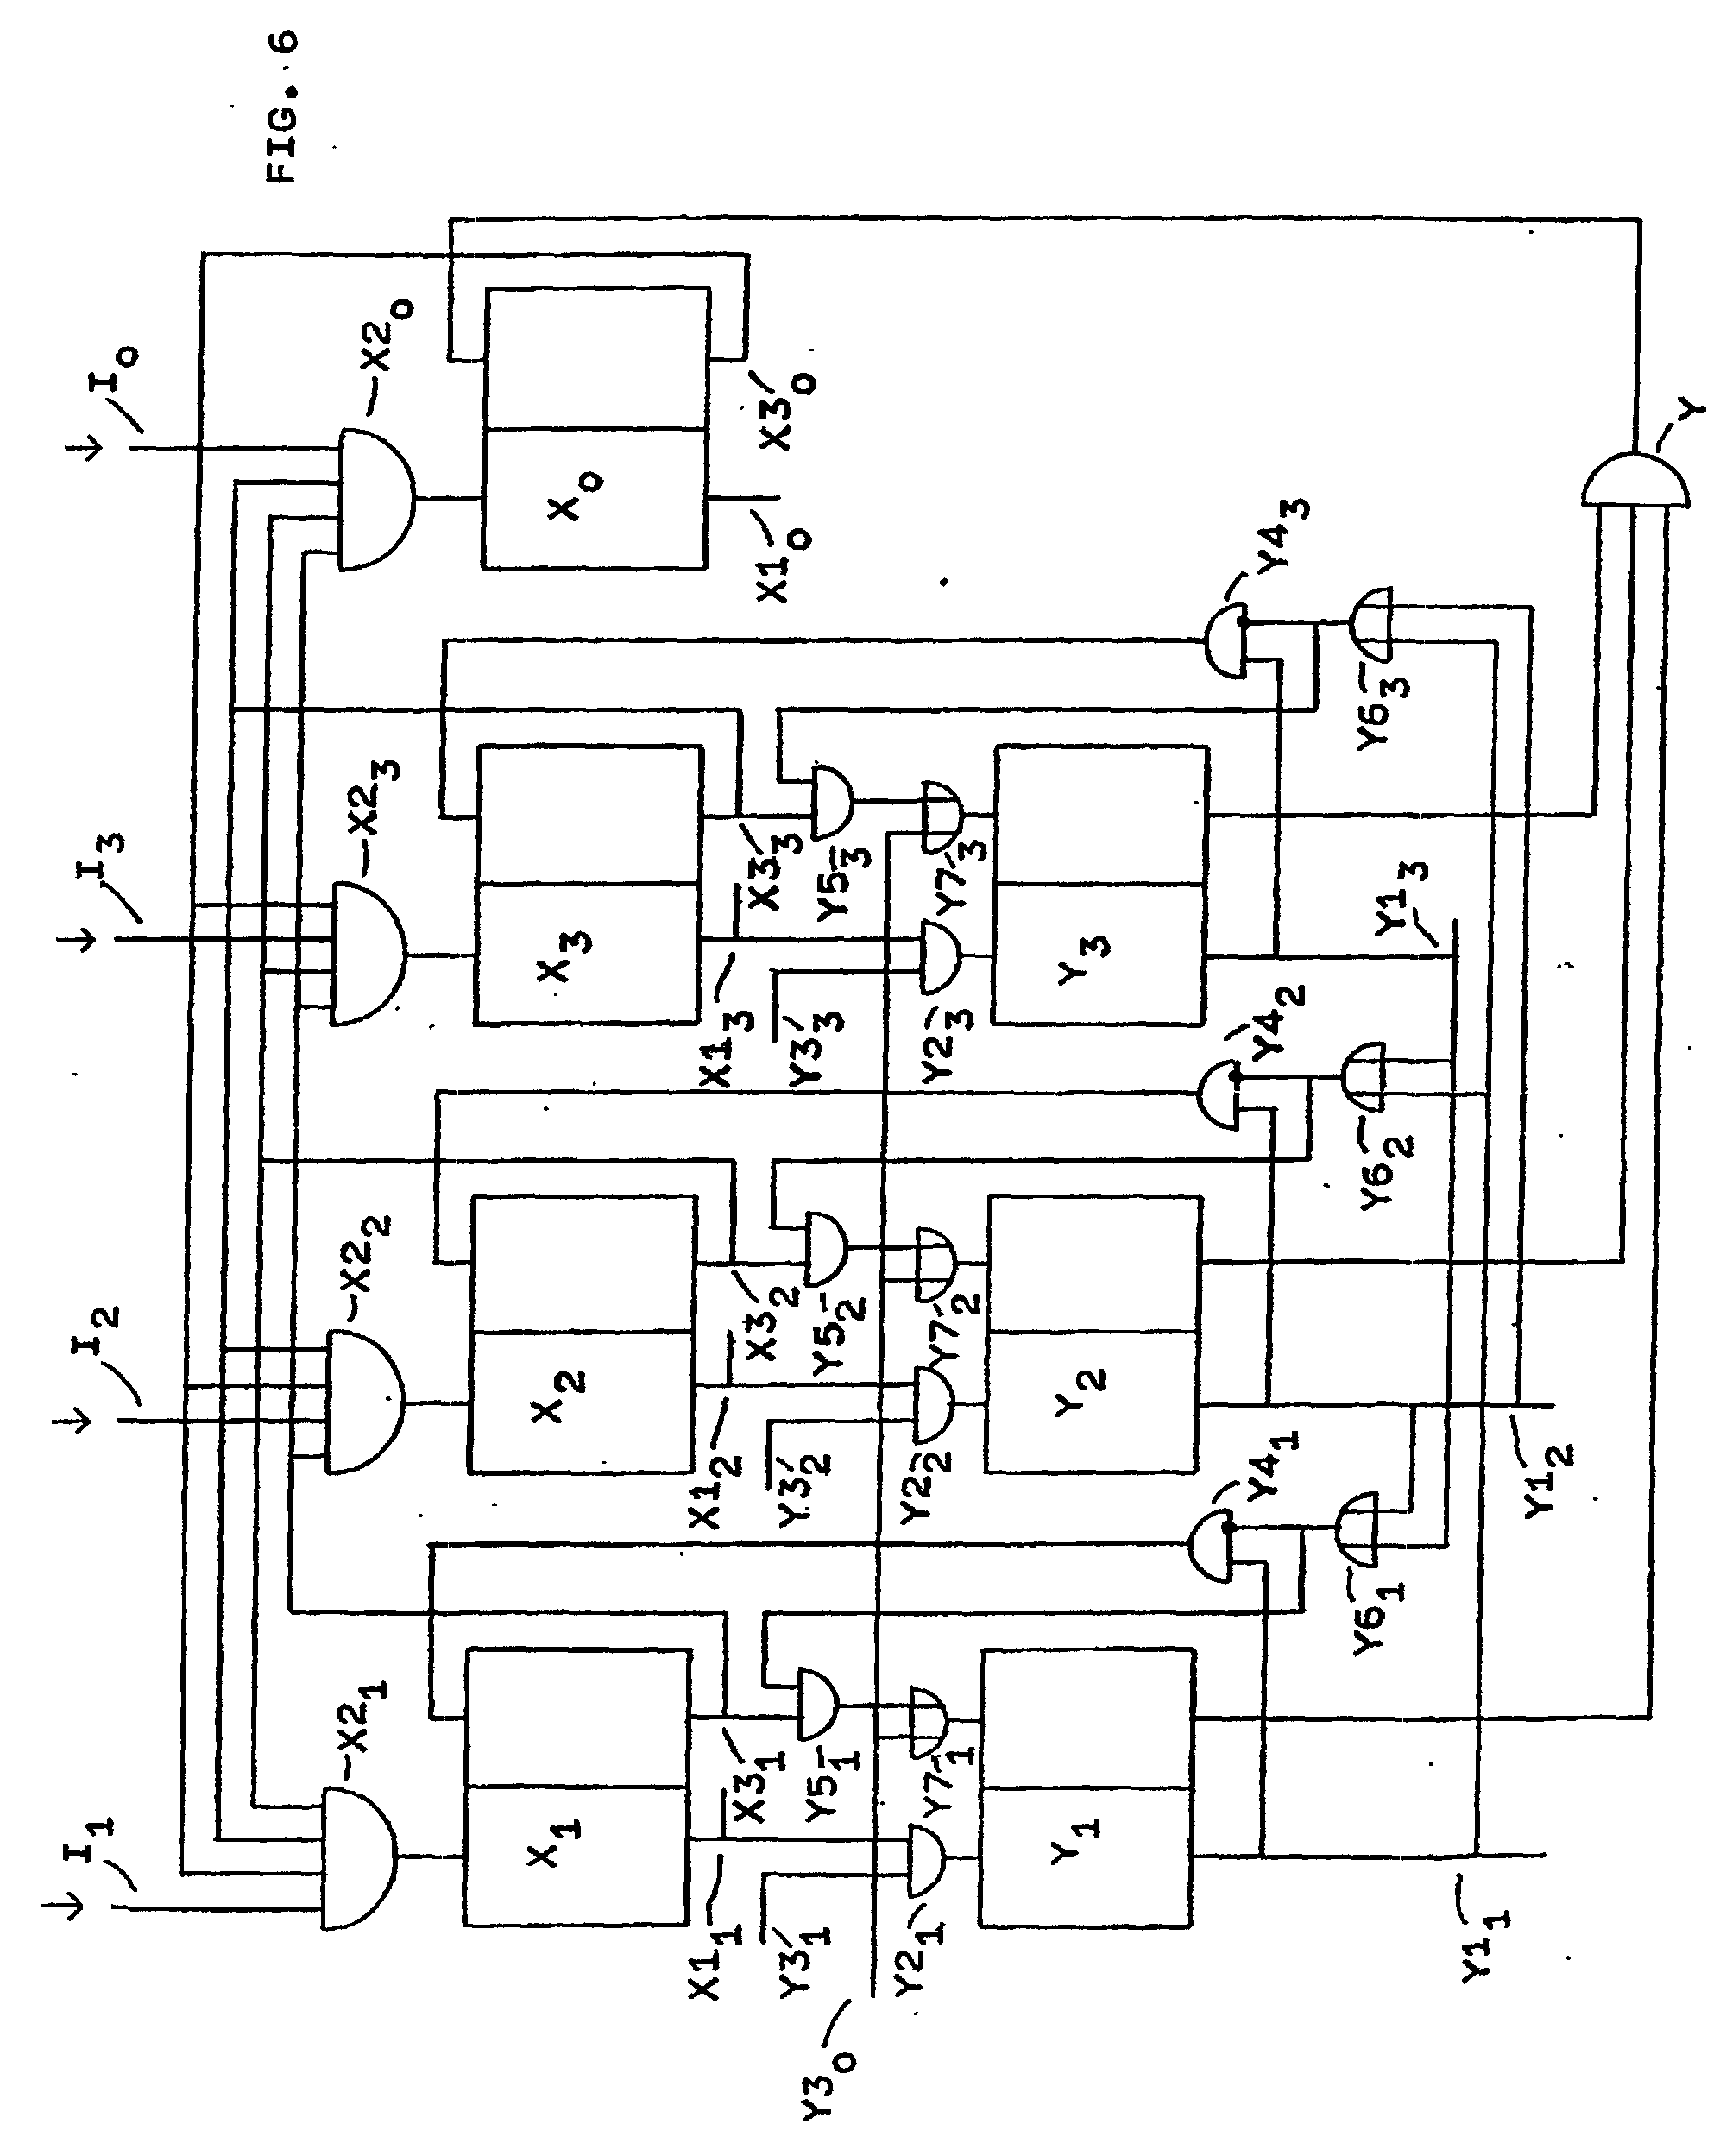 Beste Yamaha Ox66 Außenbord Schaltplan Galerie - Verdrahtungsideen ...